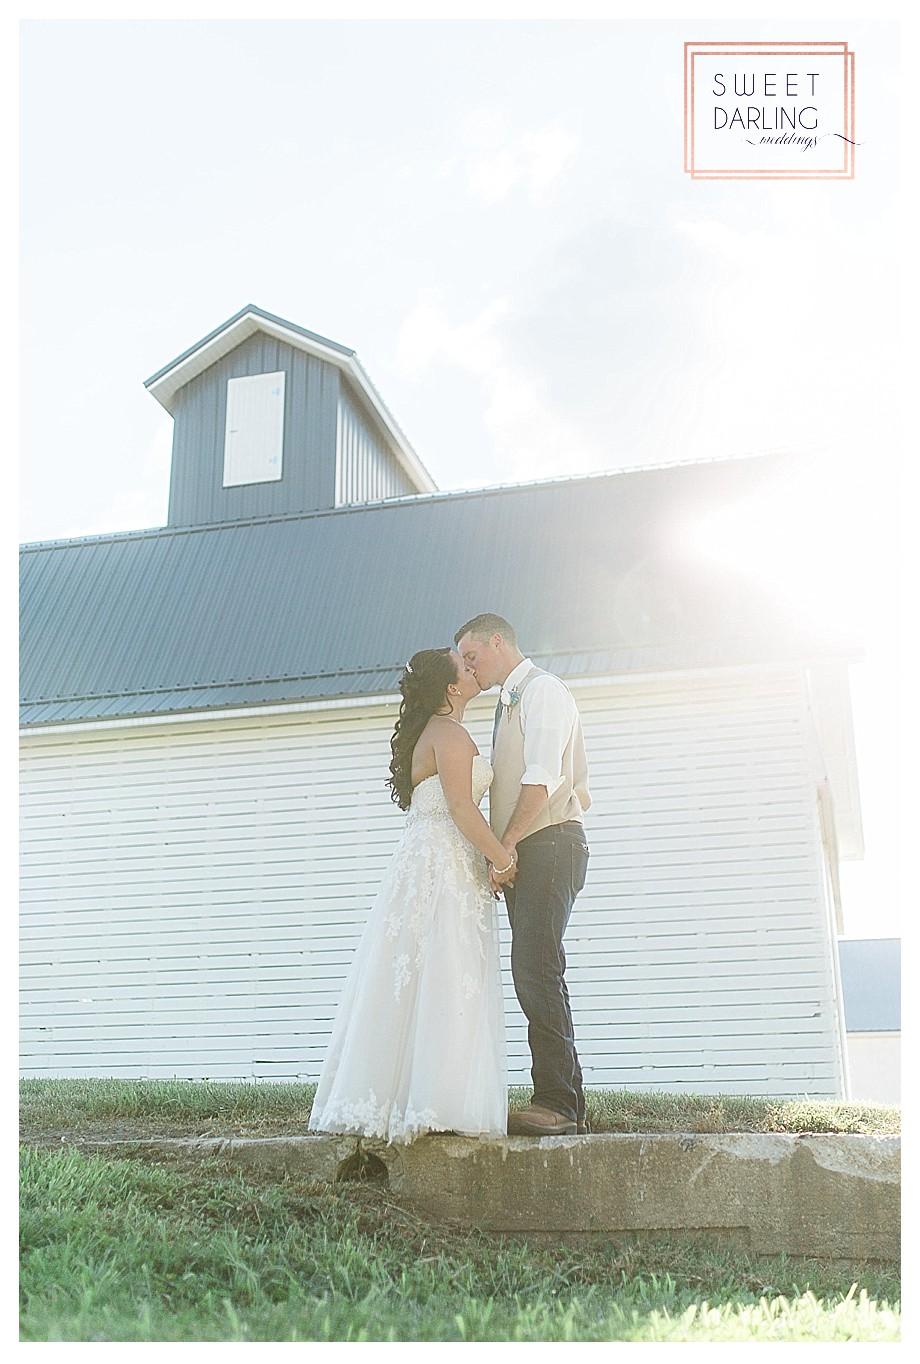 wedding-barn-farm-horses-sparkler-exit-Engelbrecht-Farm-Paxton-Illinois-Sweet-Darling-Weddings-Photographer_0511